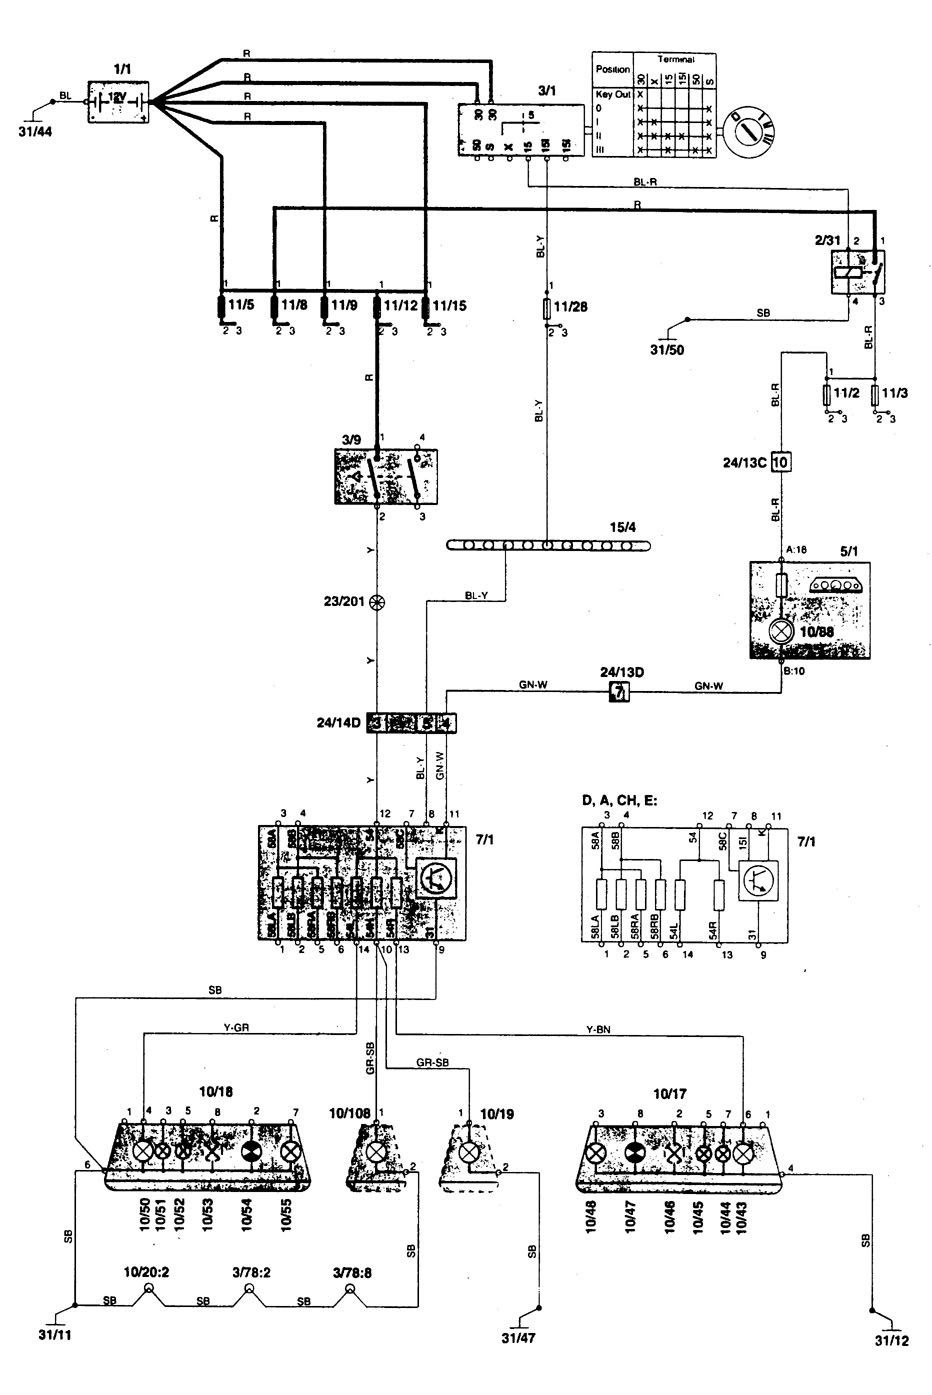 Volvo 850 1996 Wiring Diagrams Stop Lamp Carknowledge Diagram